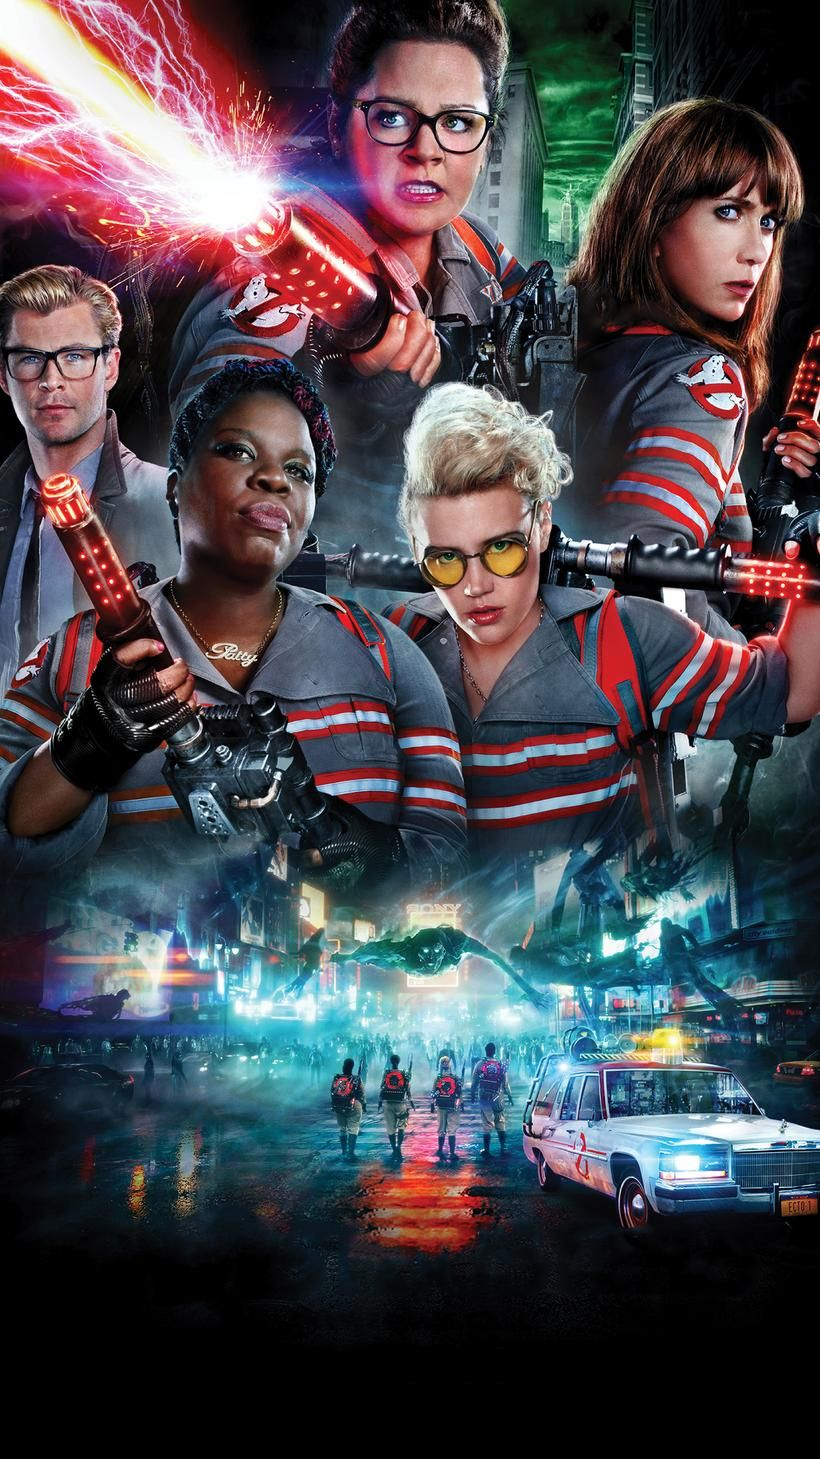 Ghostbusters 2016 Phone Wallpaper Moviemania Ghostbusters Movie Ghostbusters Ghostbusters 2016